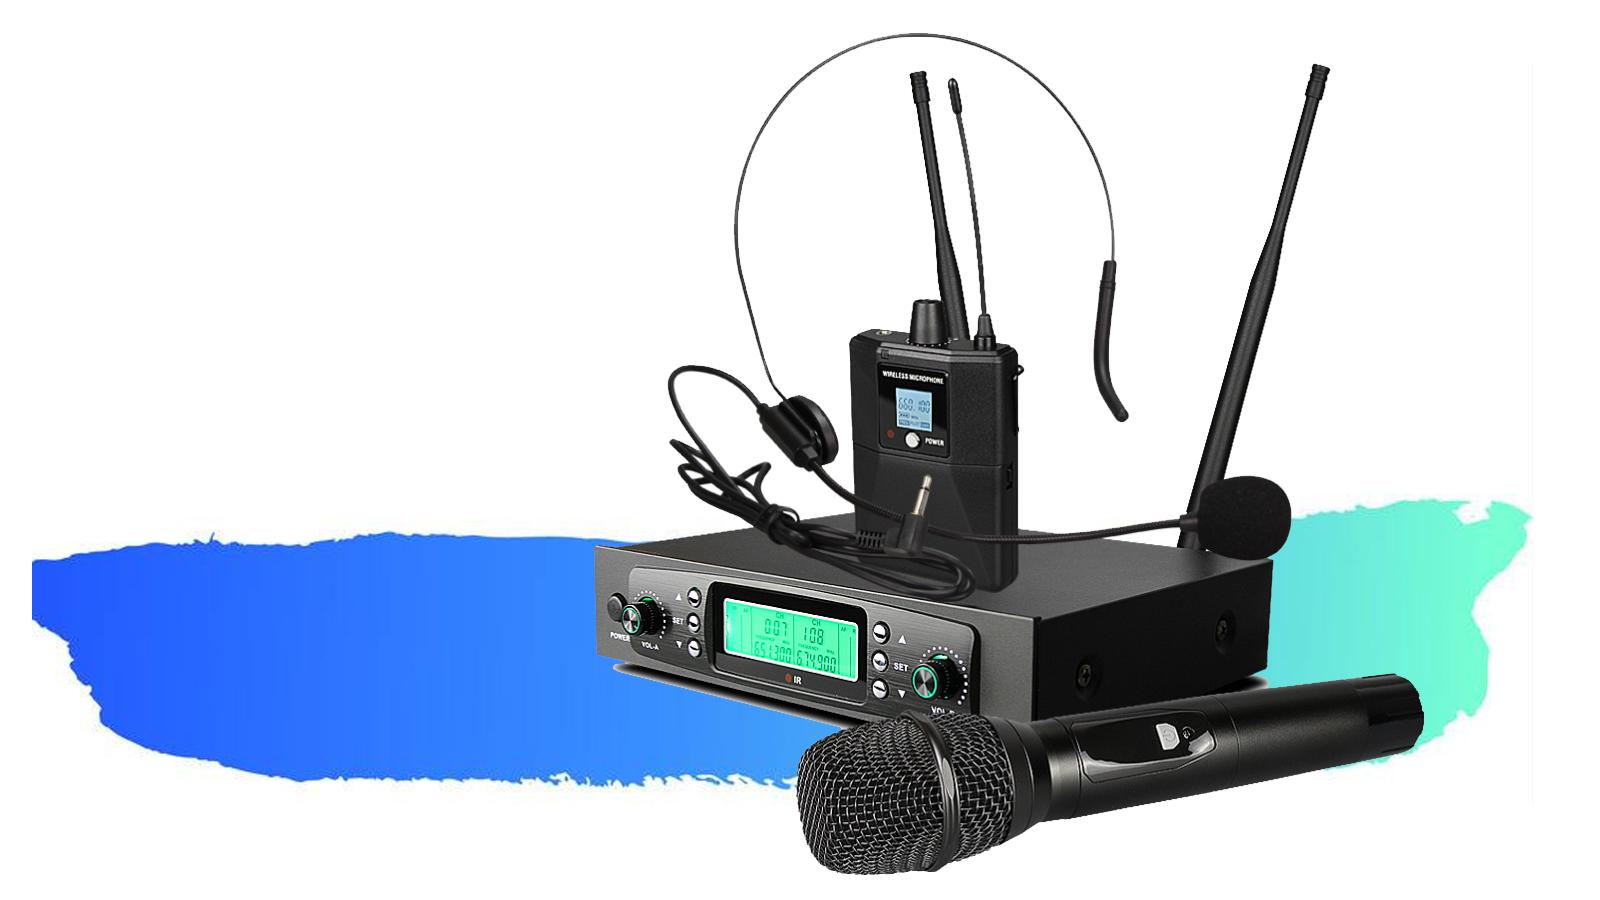 2020 Jarak Jauh Sensitif Tinggi Kerah UHF Radio Mikrofon Nirkabel